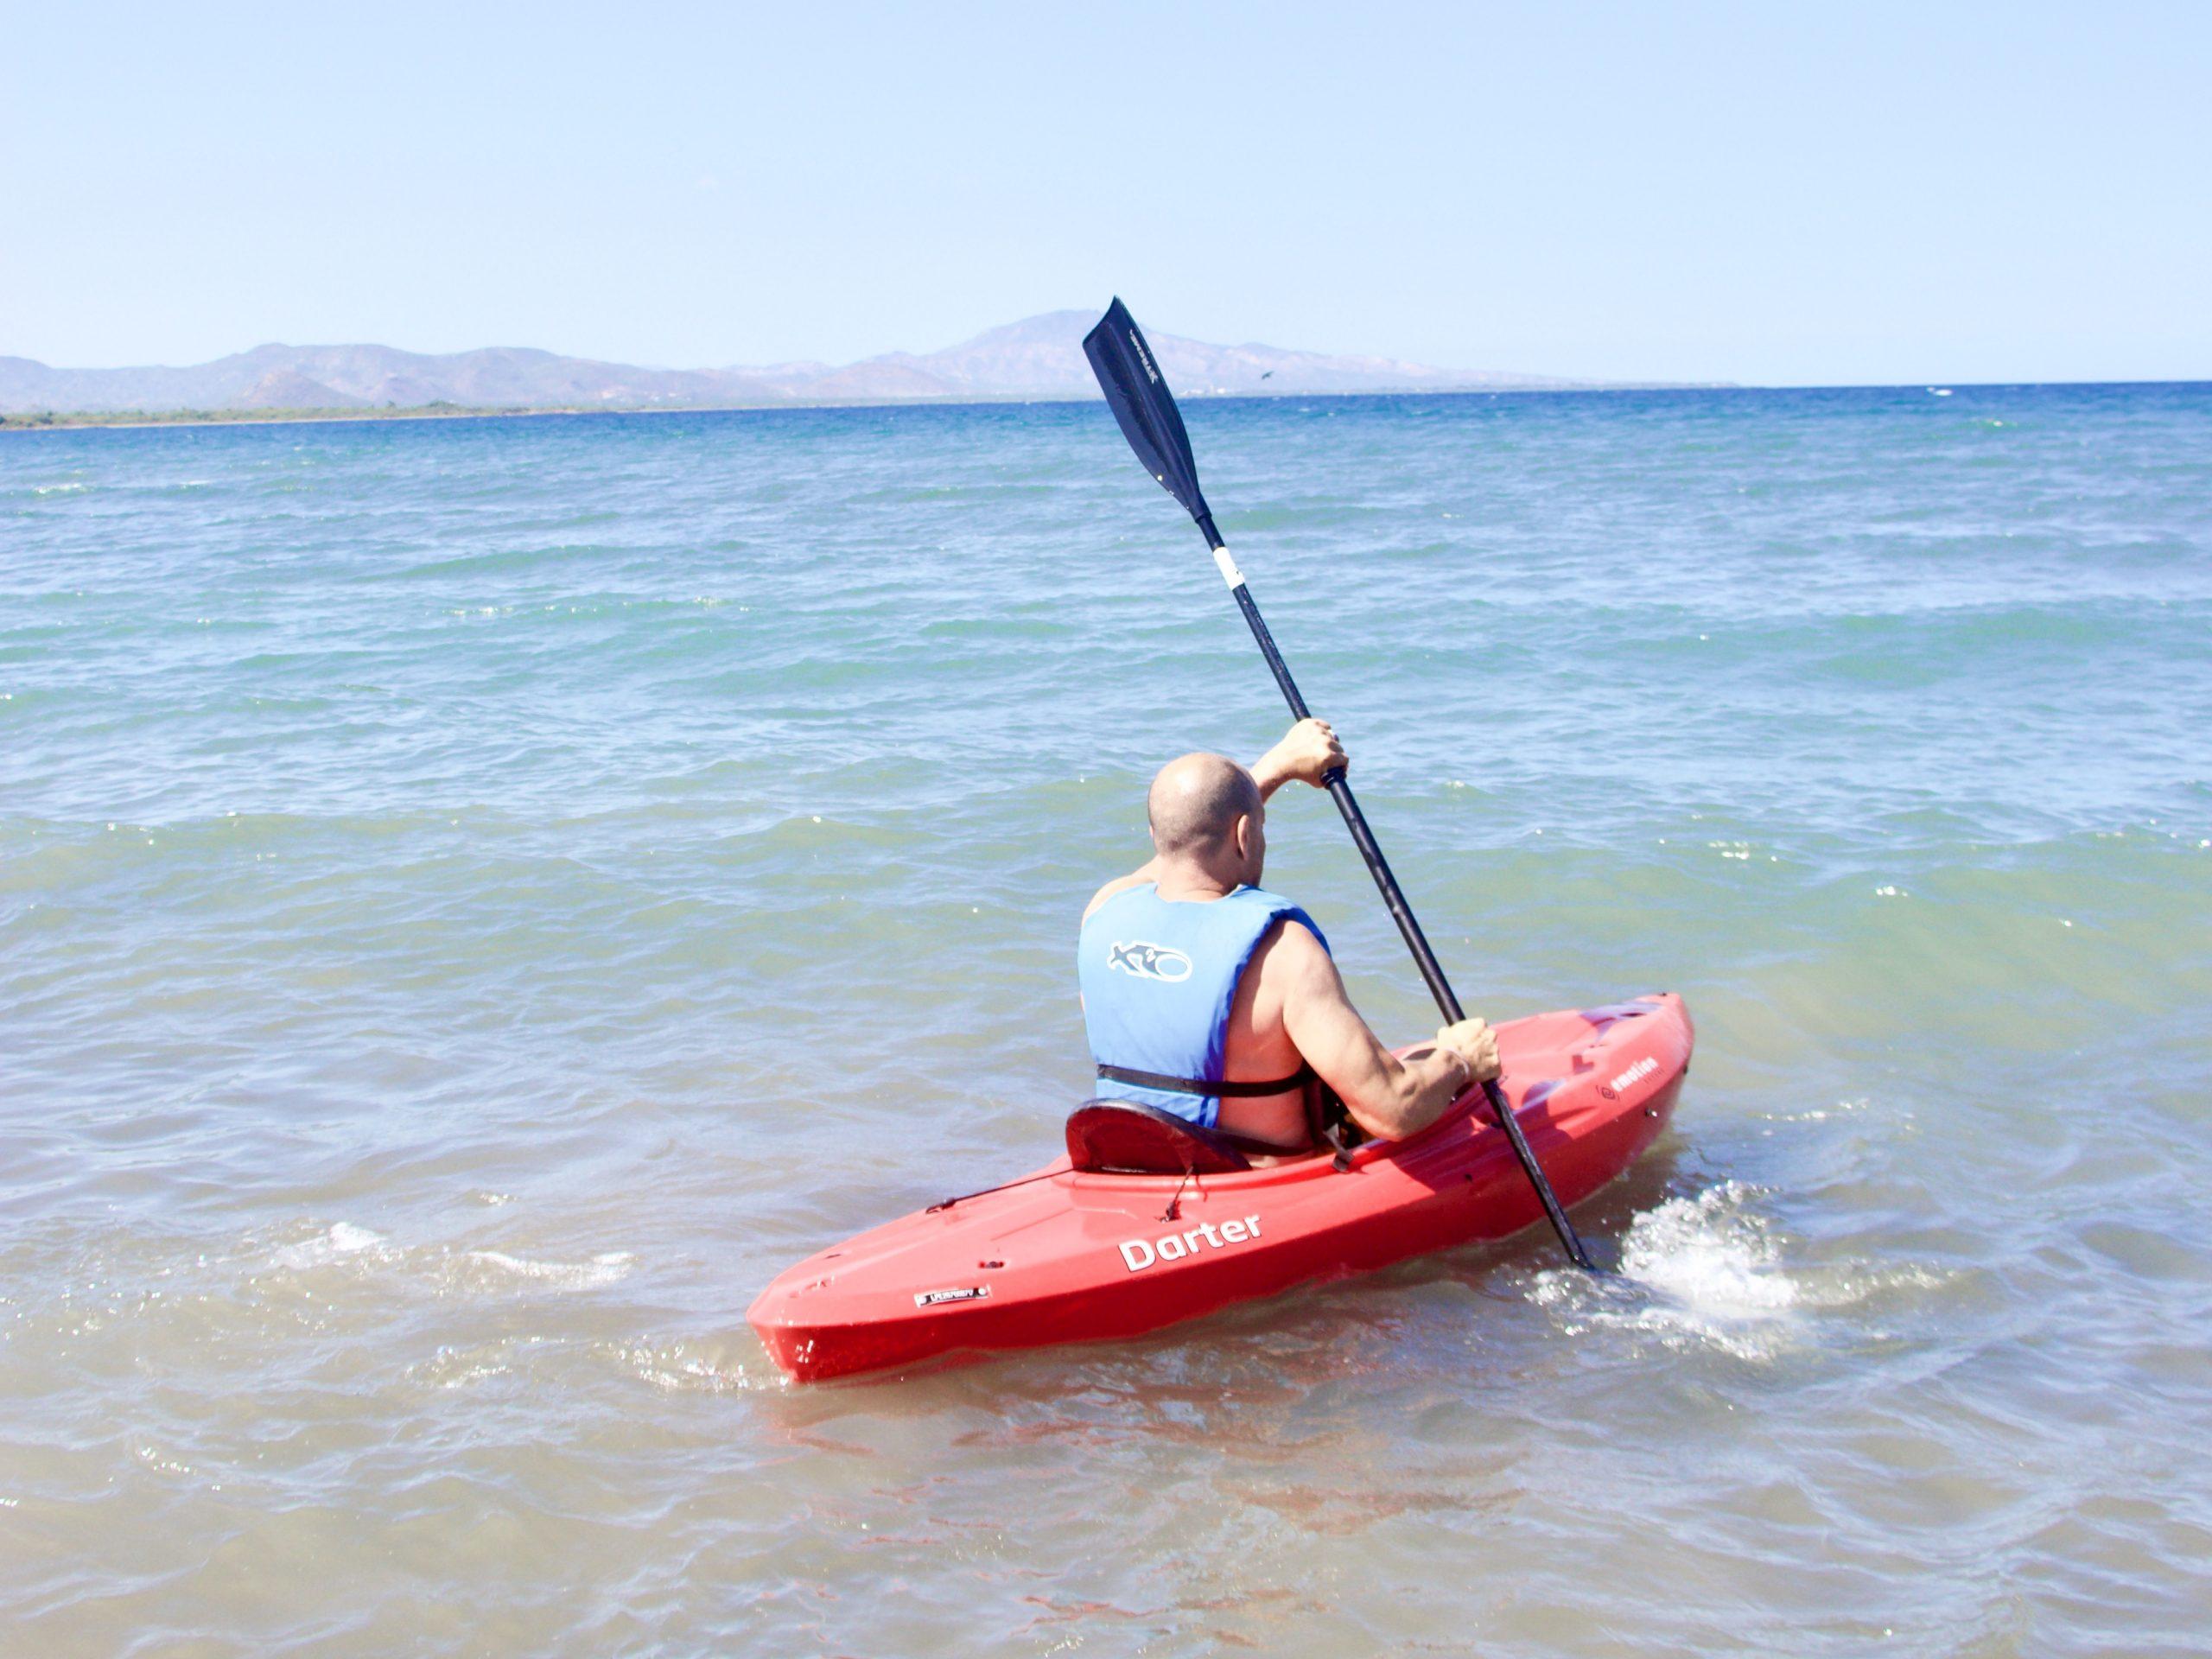 Man kayaking on Sea of Cortez in Loreto, Mexico